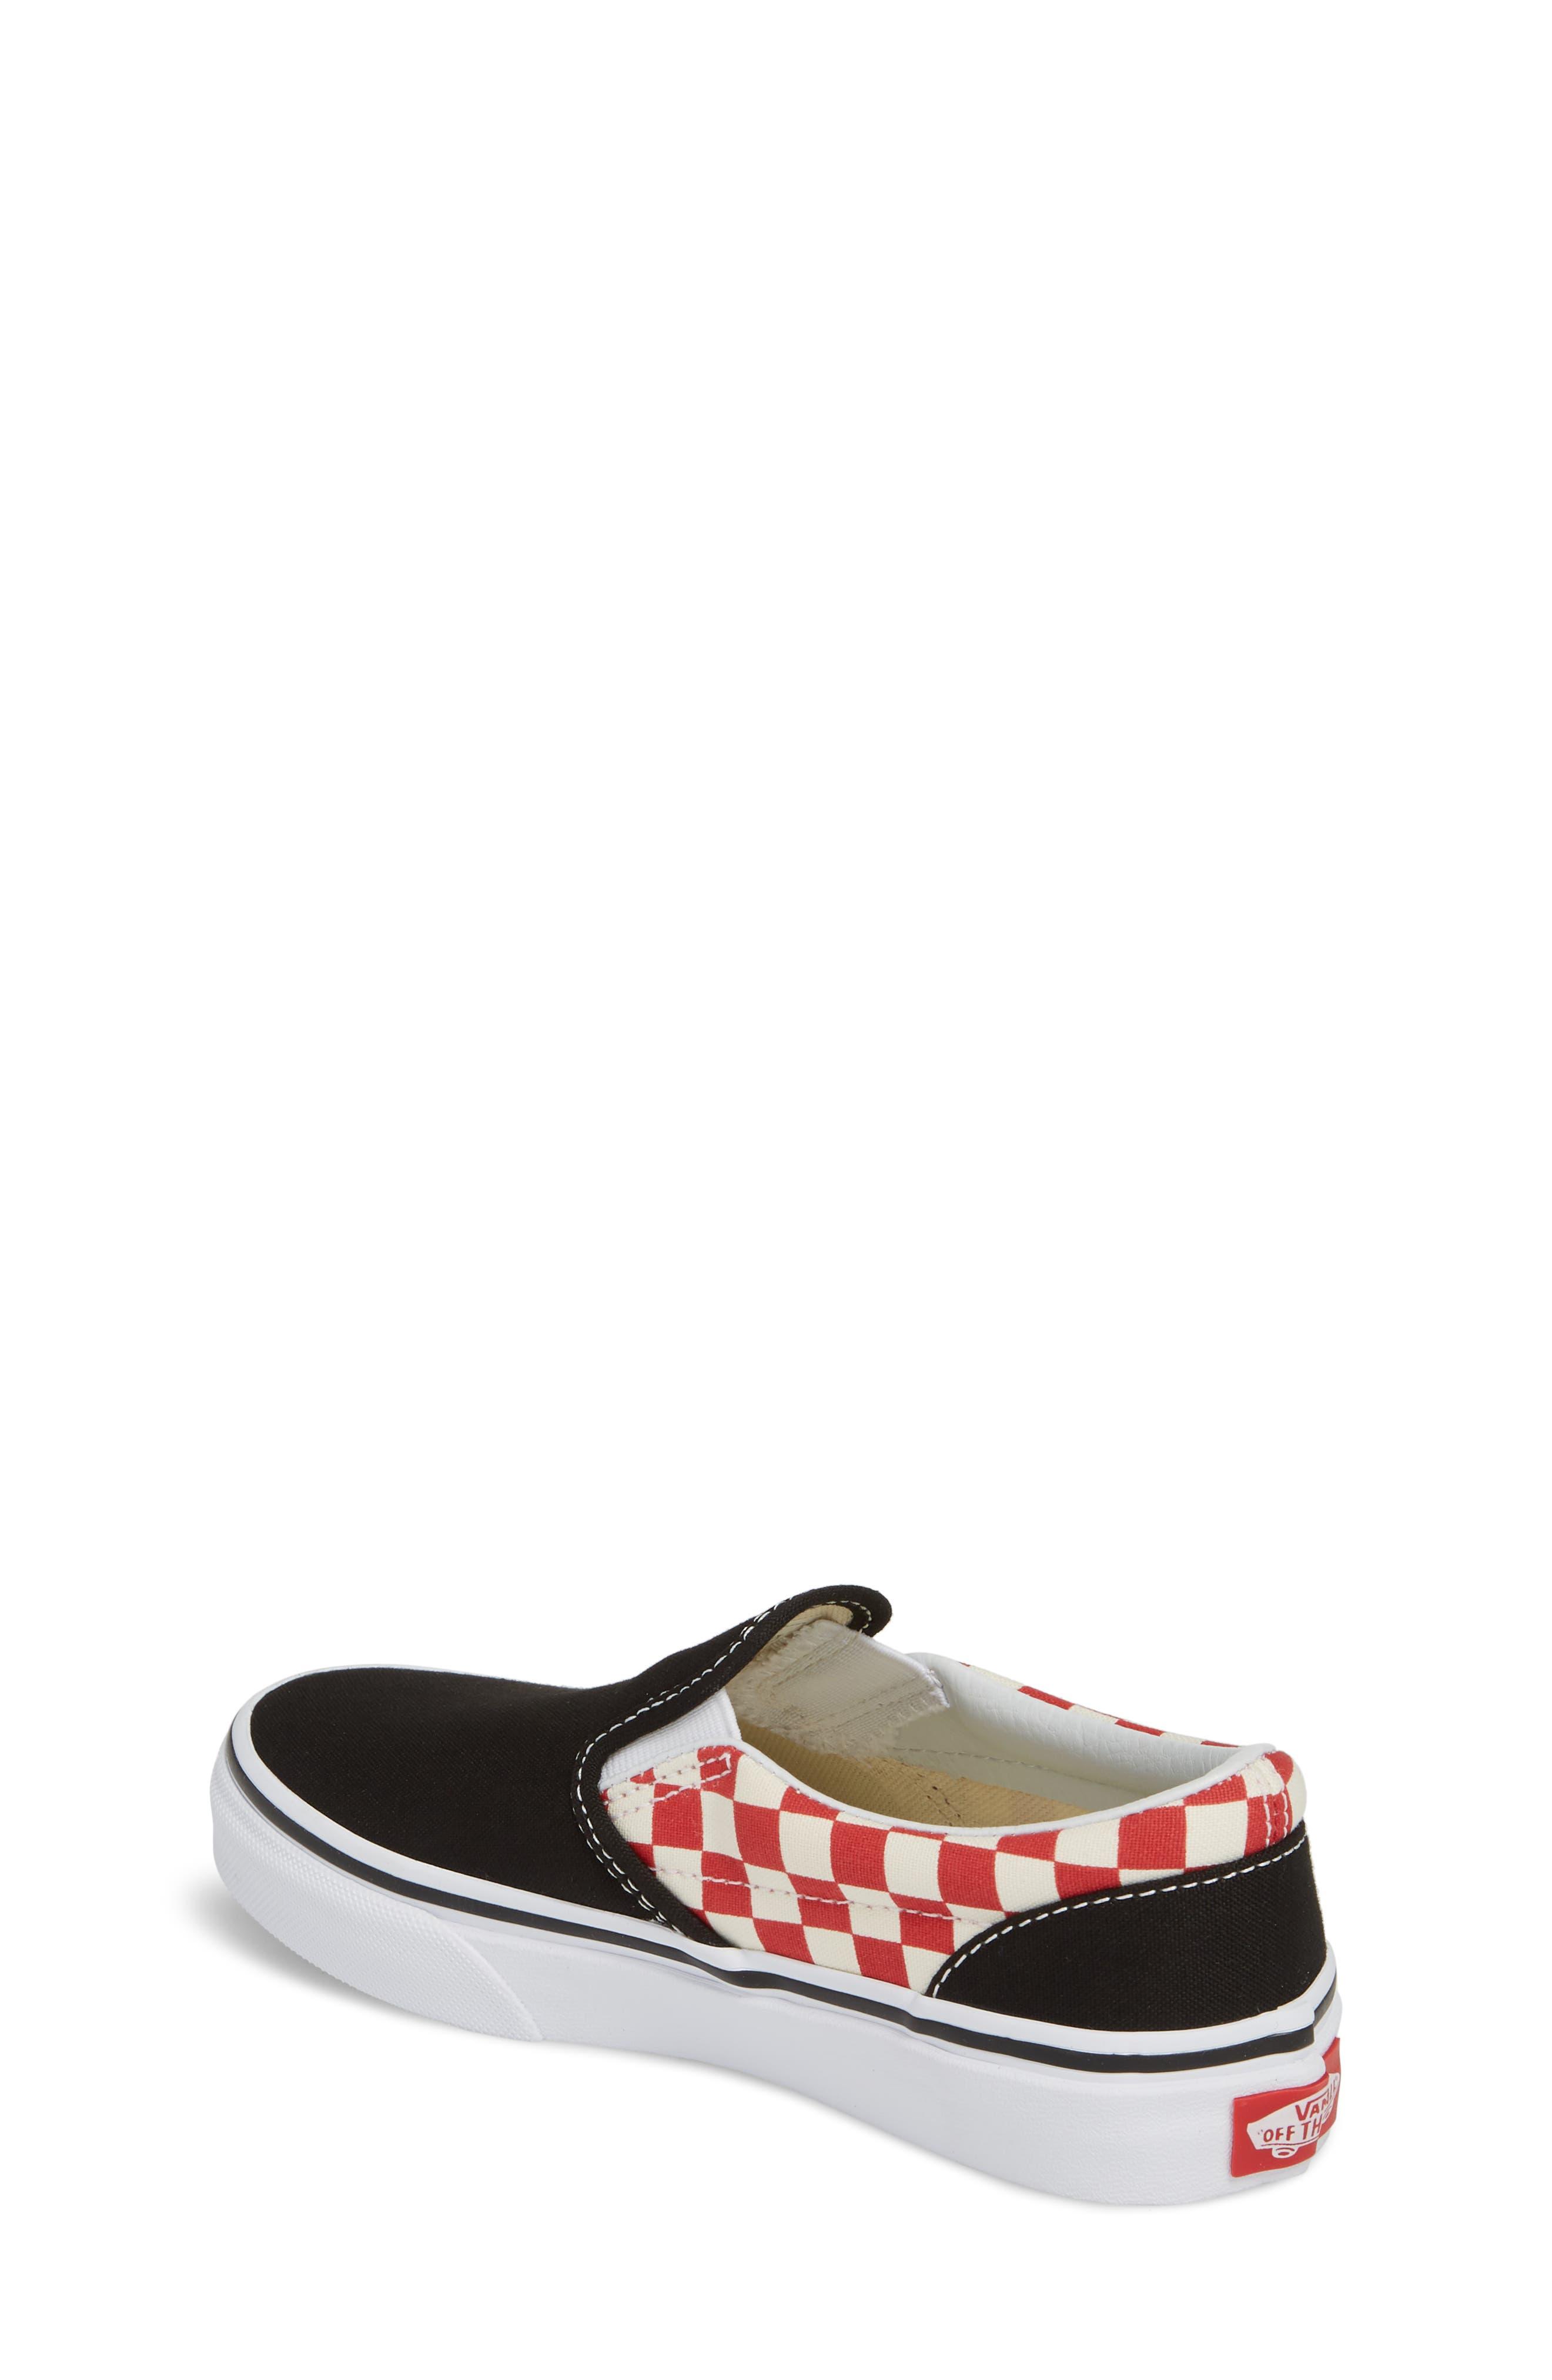 Kids Vans Shoes